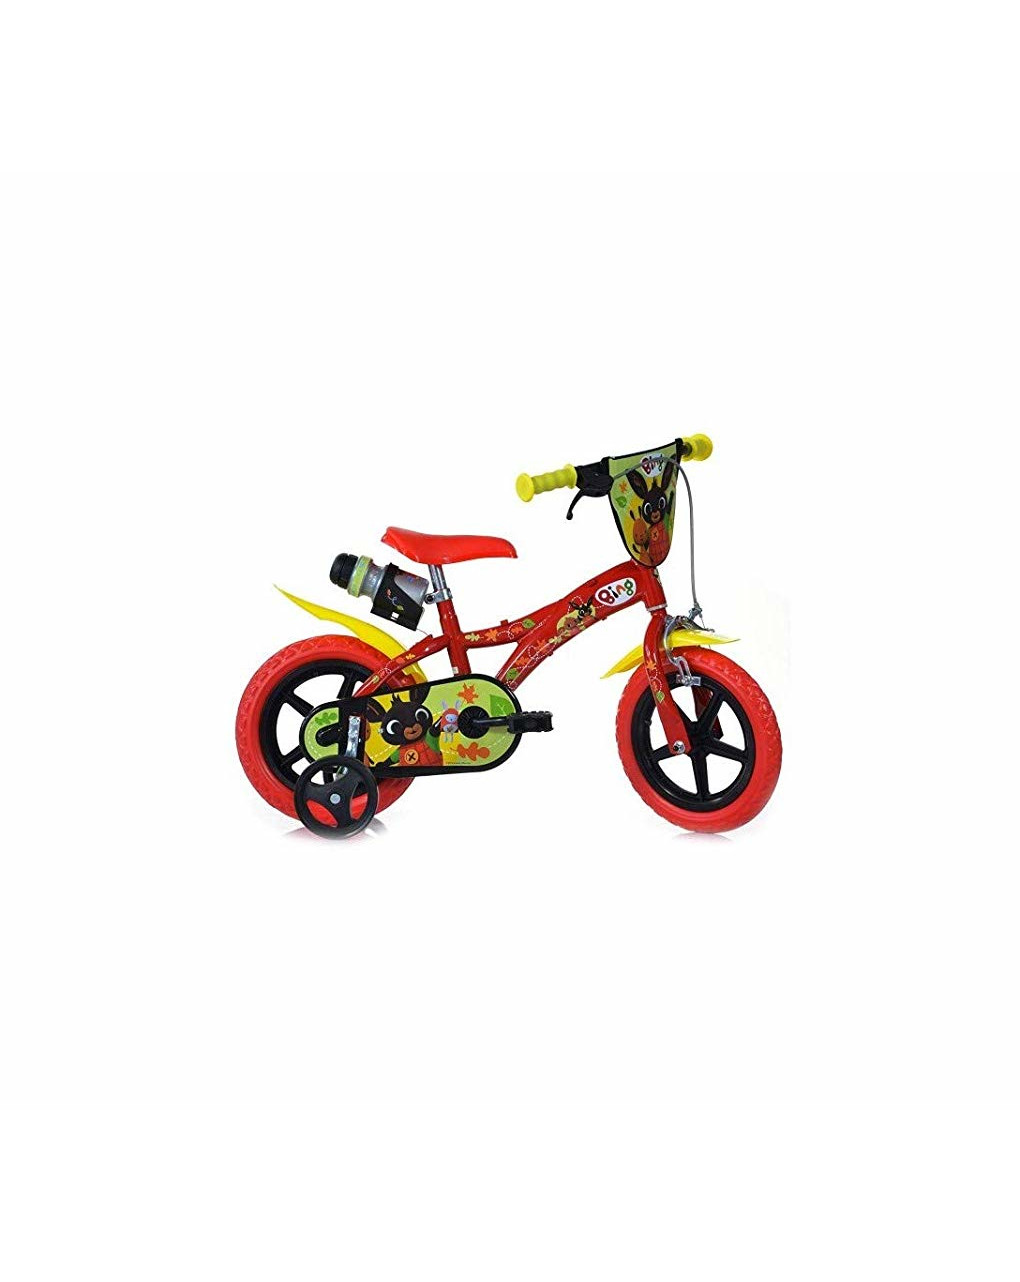 Bici 12'' bing - Bing